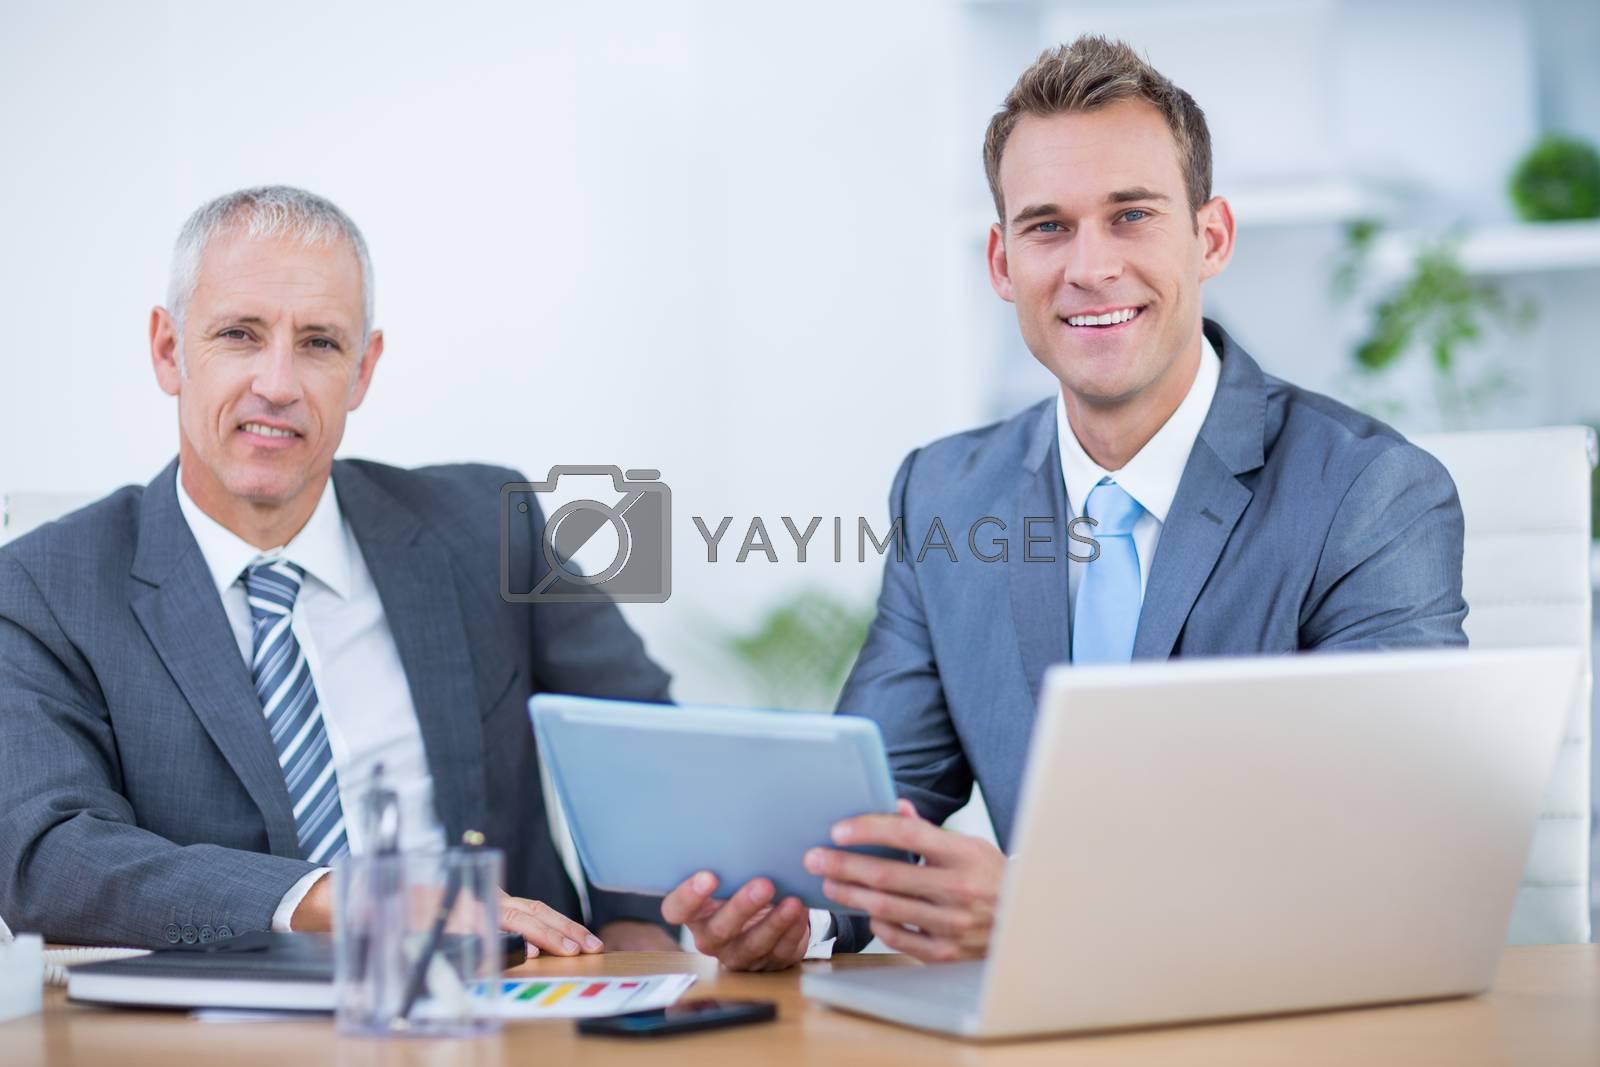 Royalty free image of Happy businessmen working together on digital tablet by Wavebreakmedia